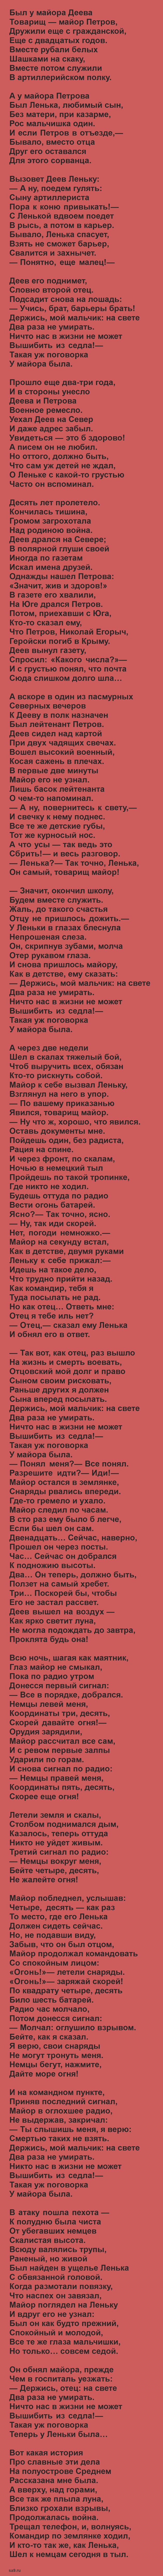 Читать стихи Симонова - Сын артиллериста